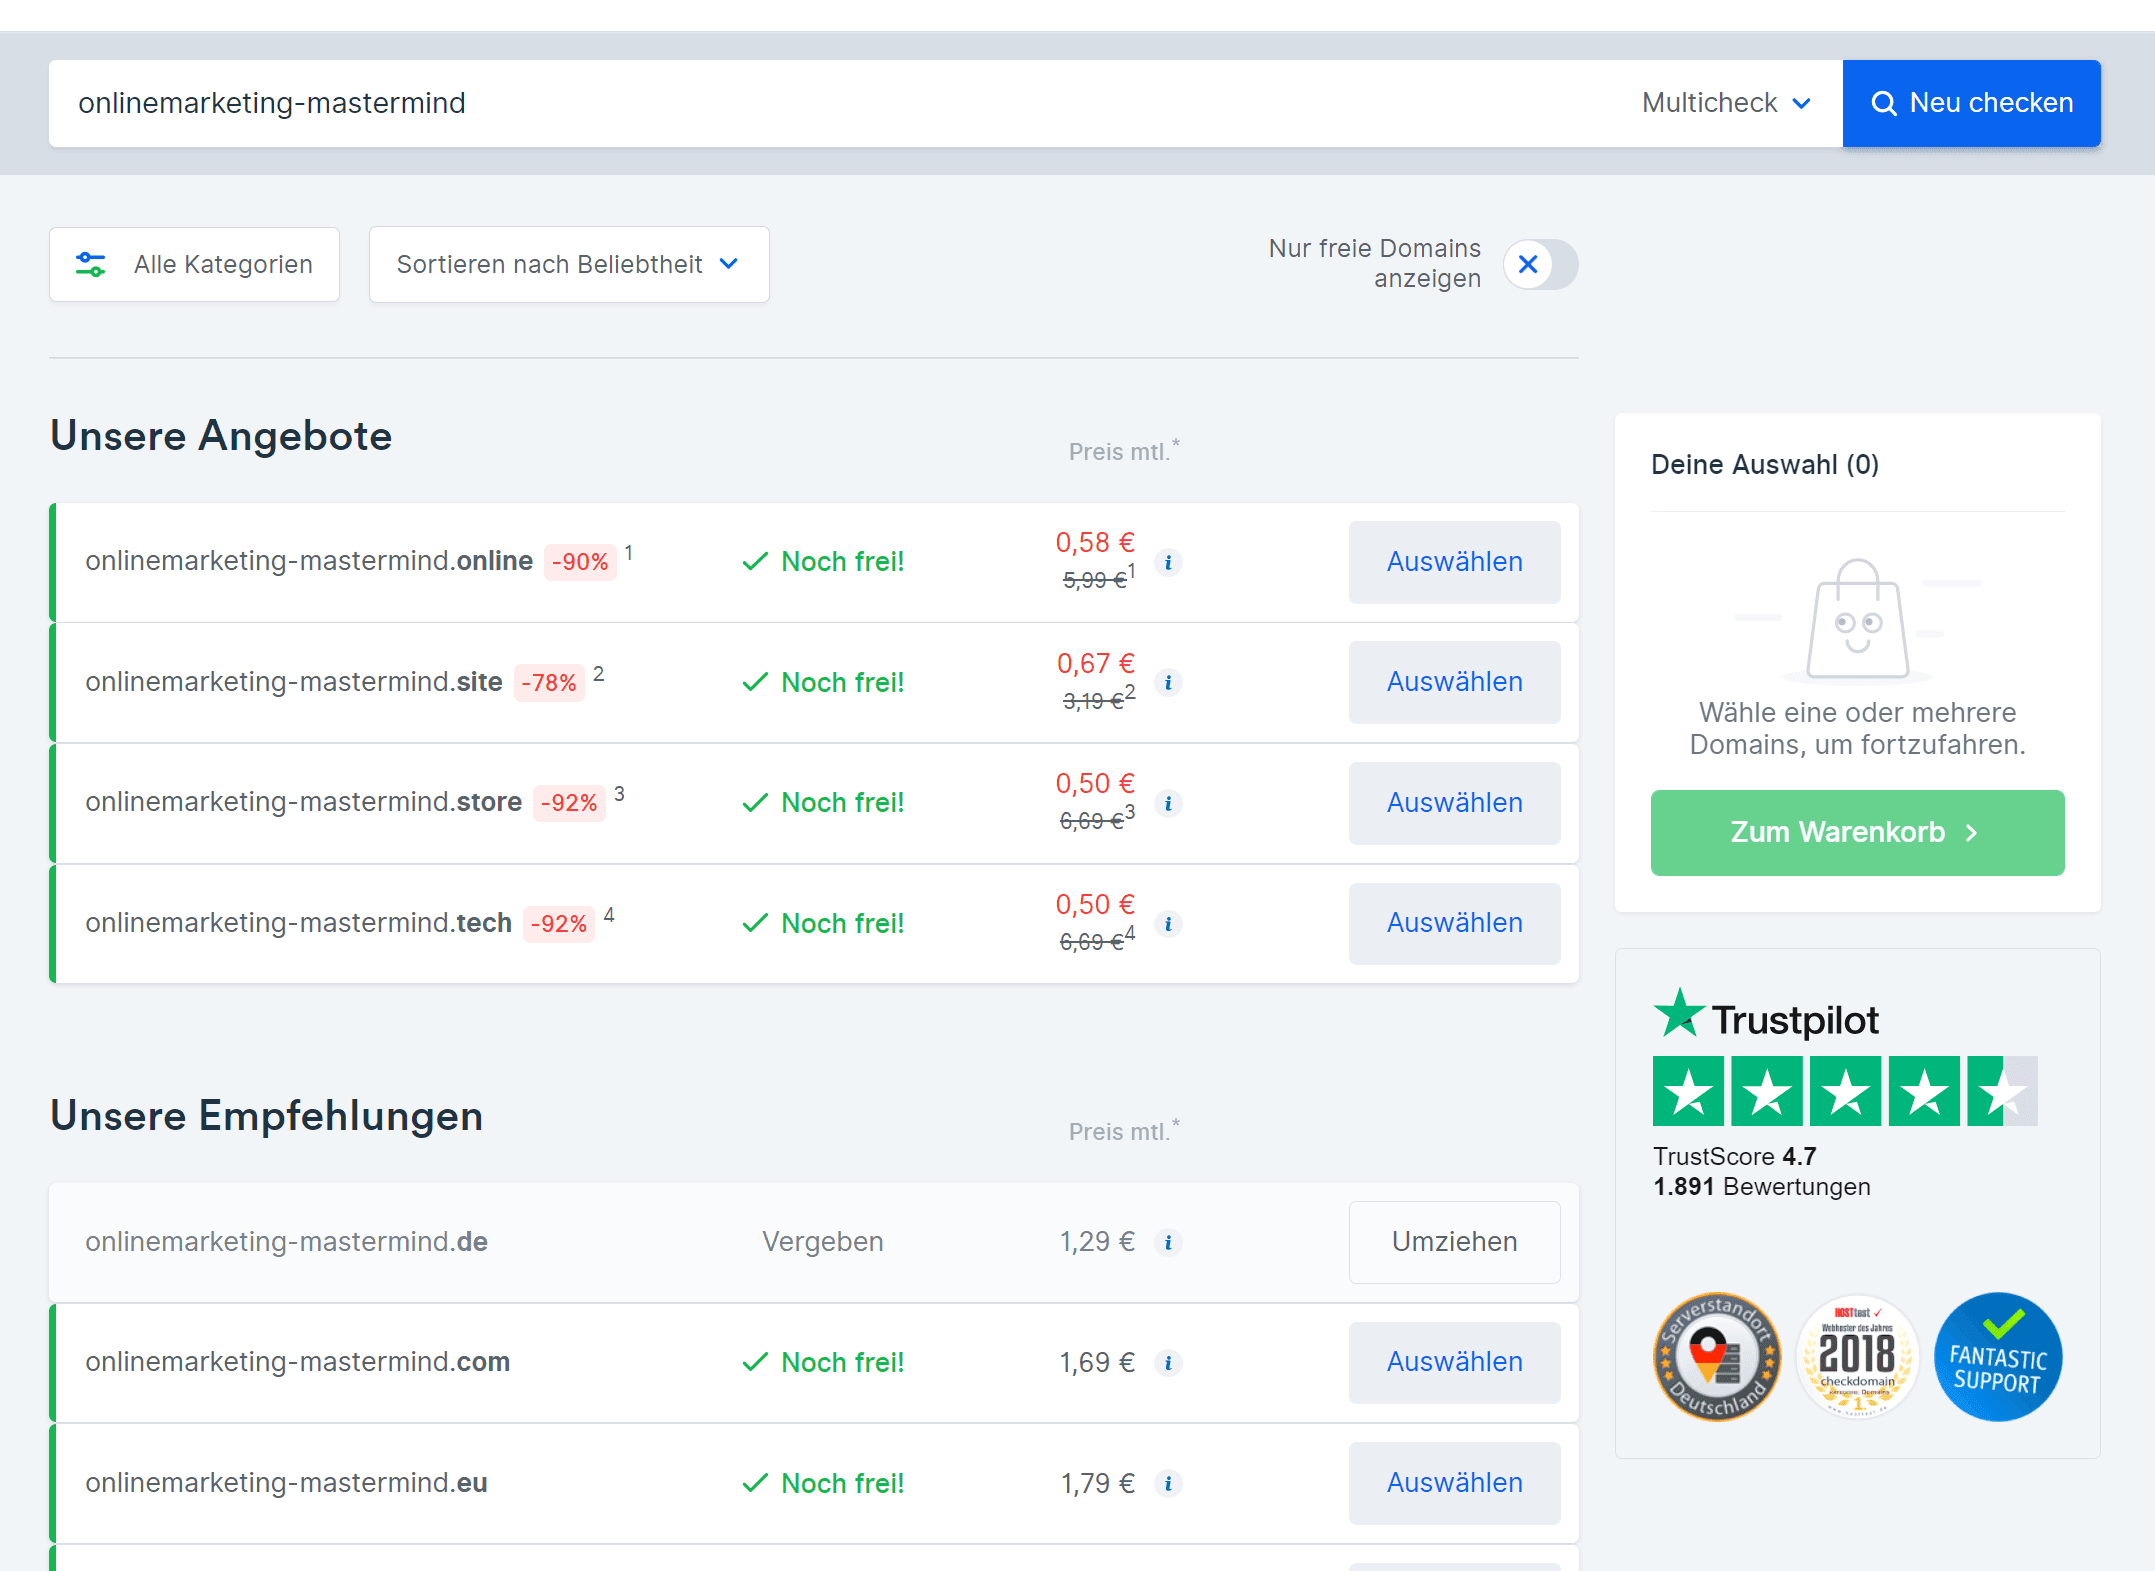 Checkdomain verfügbare Domains